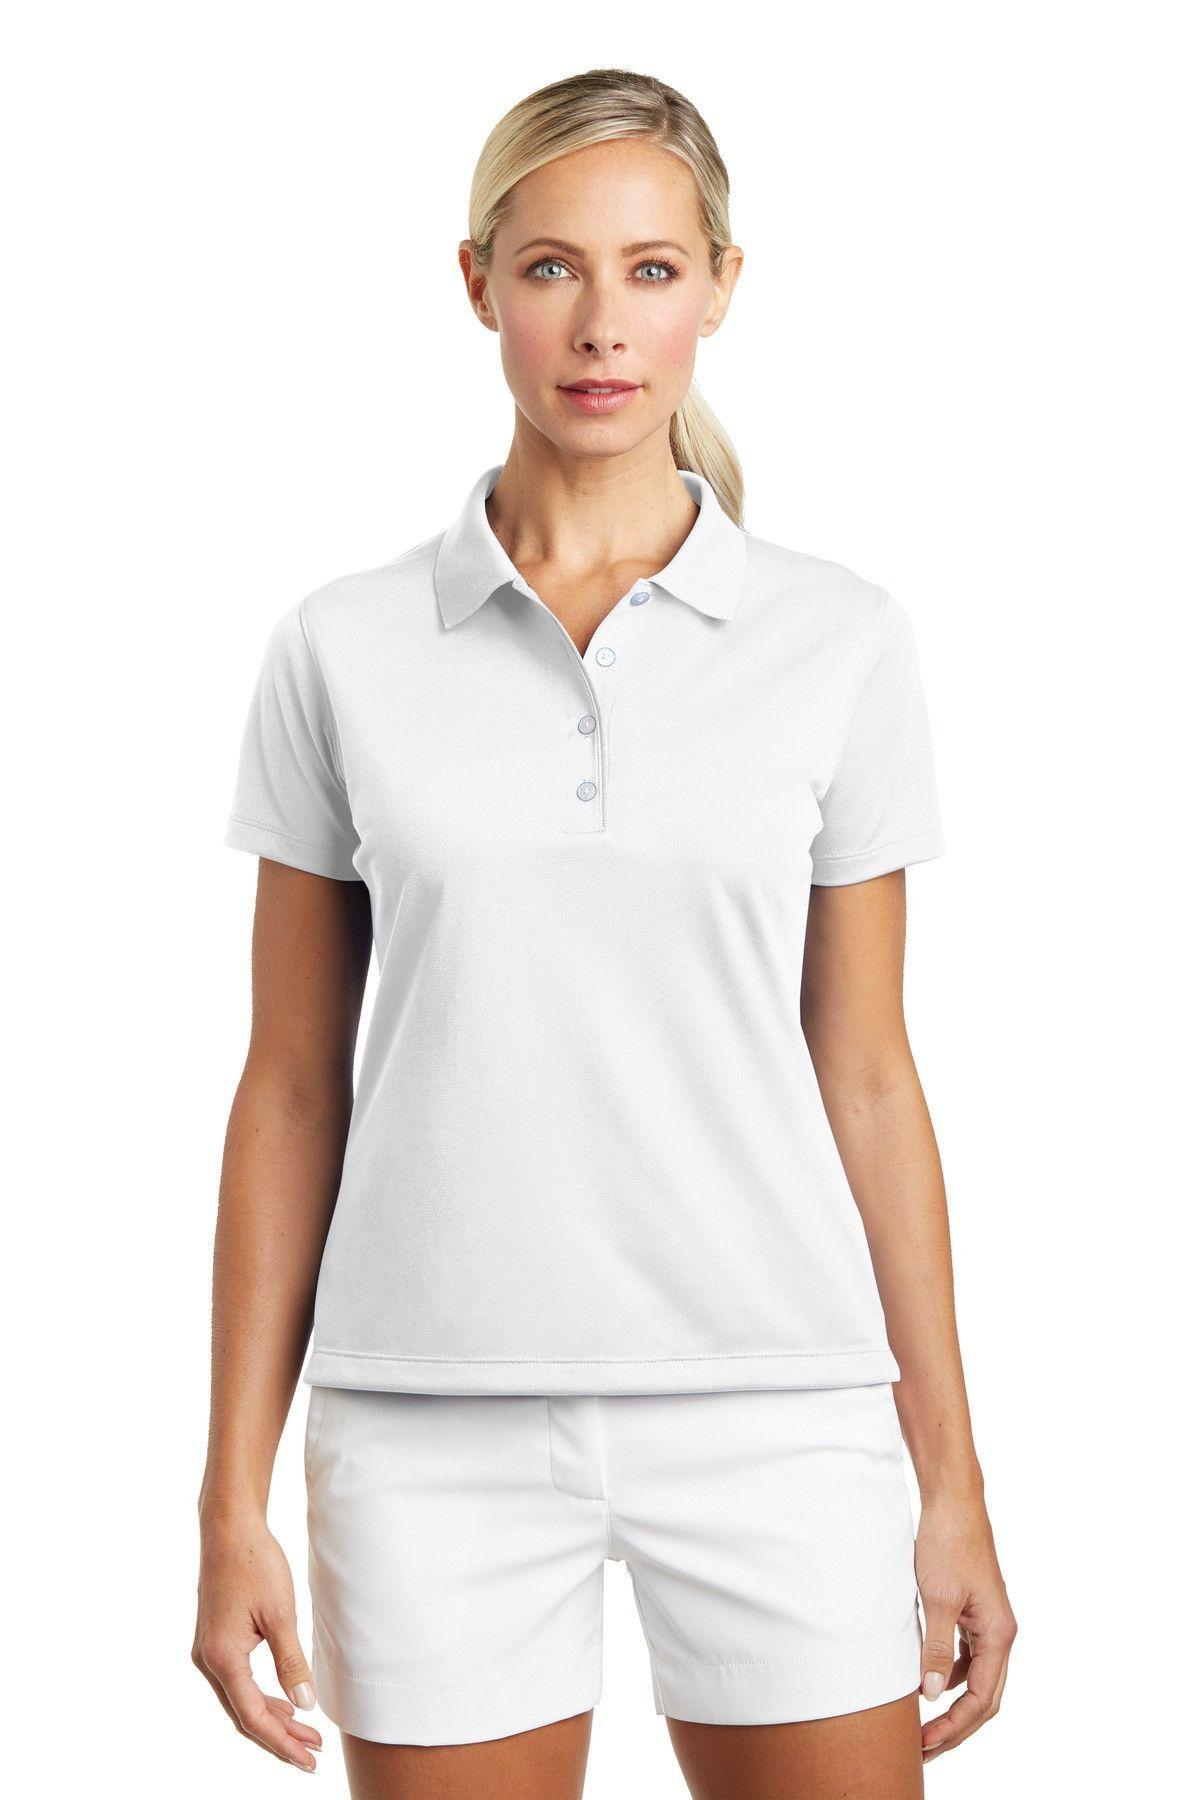 Nike Dri Fit Polo Shirts Custom Rockwall Auction